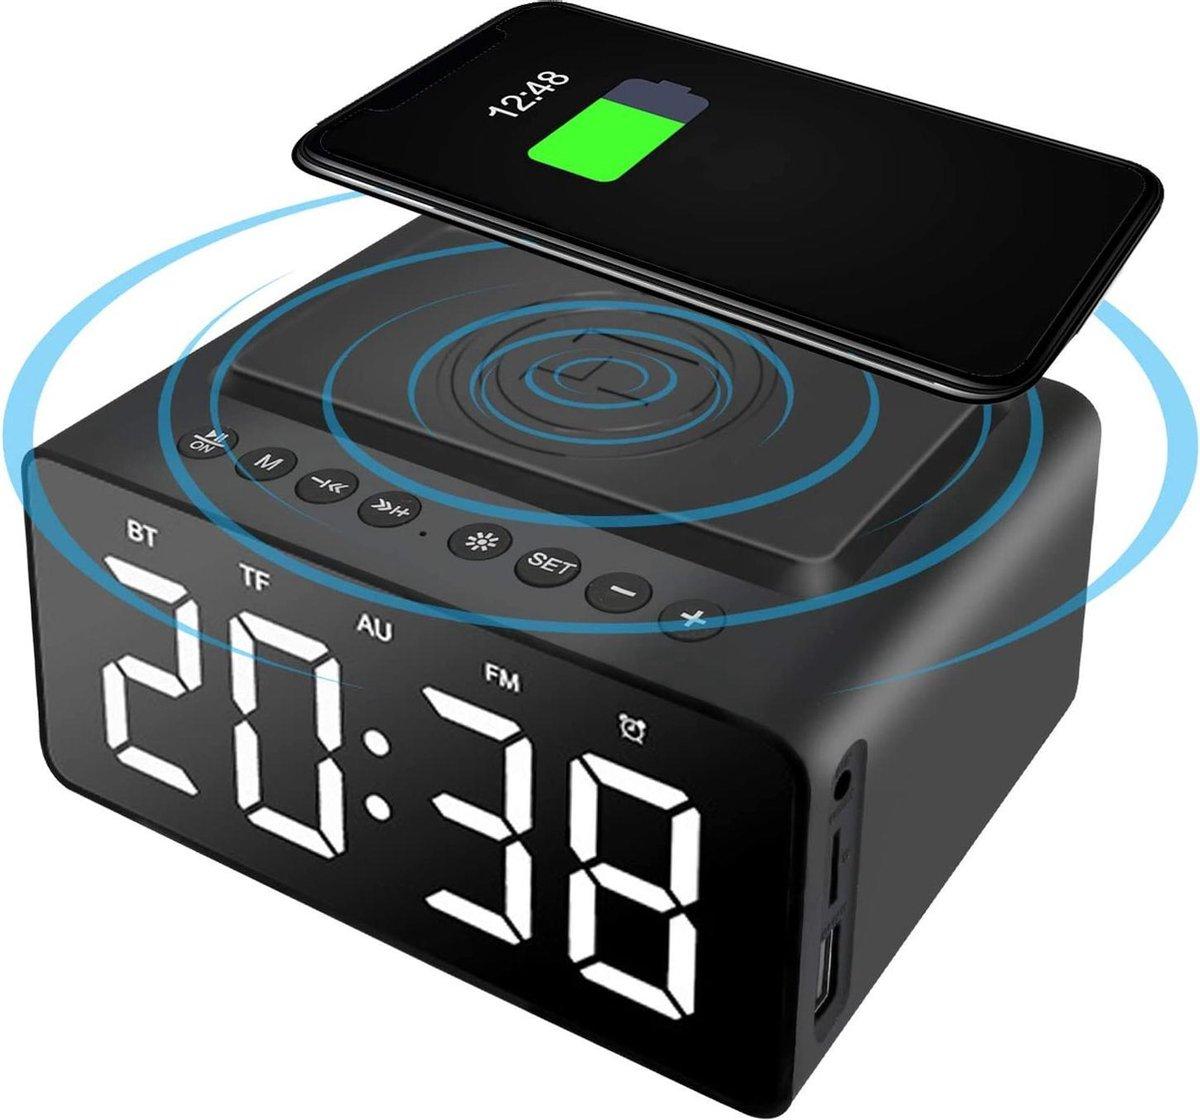 Garpex® Smart Alarmklok Speaker met Wireless Charging - 4 in 1 - Draadloos Opladen - Bluetooth Speaker - Wekker